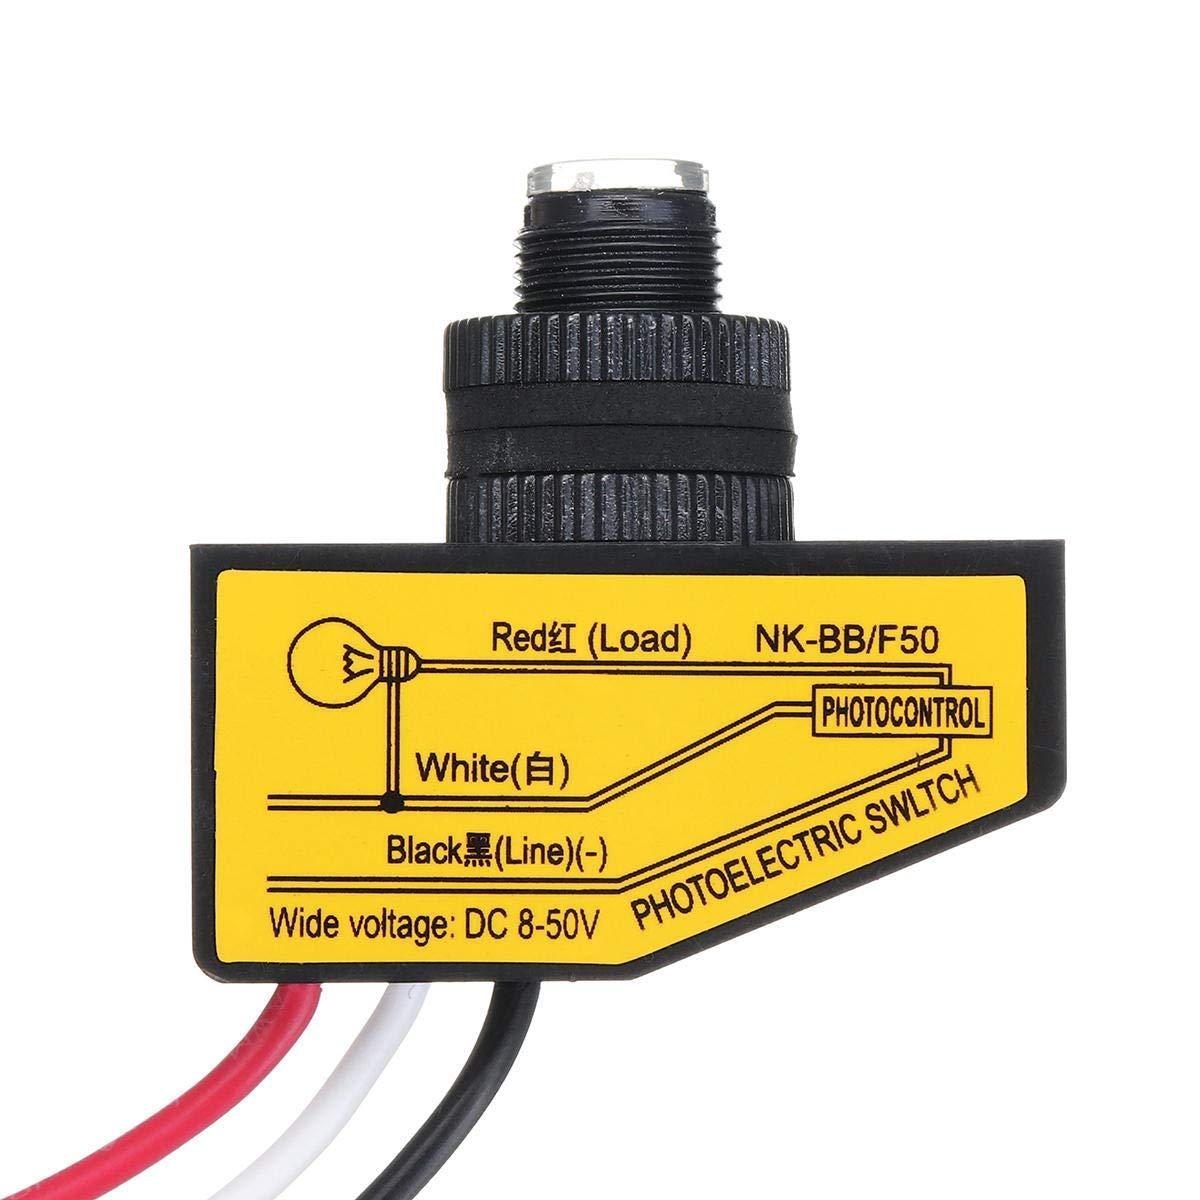 8-50VDC Photocell Sensor Dusk To Dawn Sensor Photoelectric Switch Sensor Automatic C - Electrical Equipment & Supplies Other Electrical Equipment - 1 x Photoelectric Switch